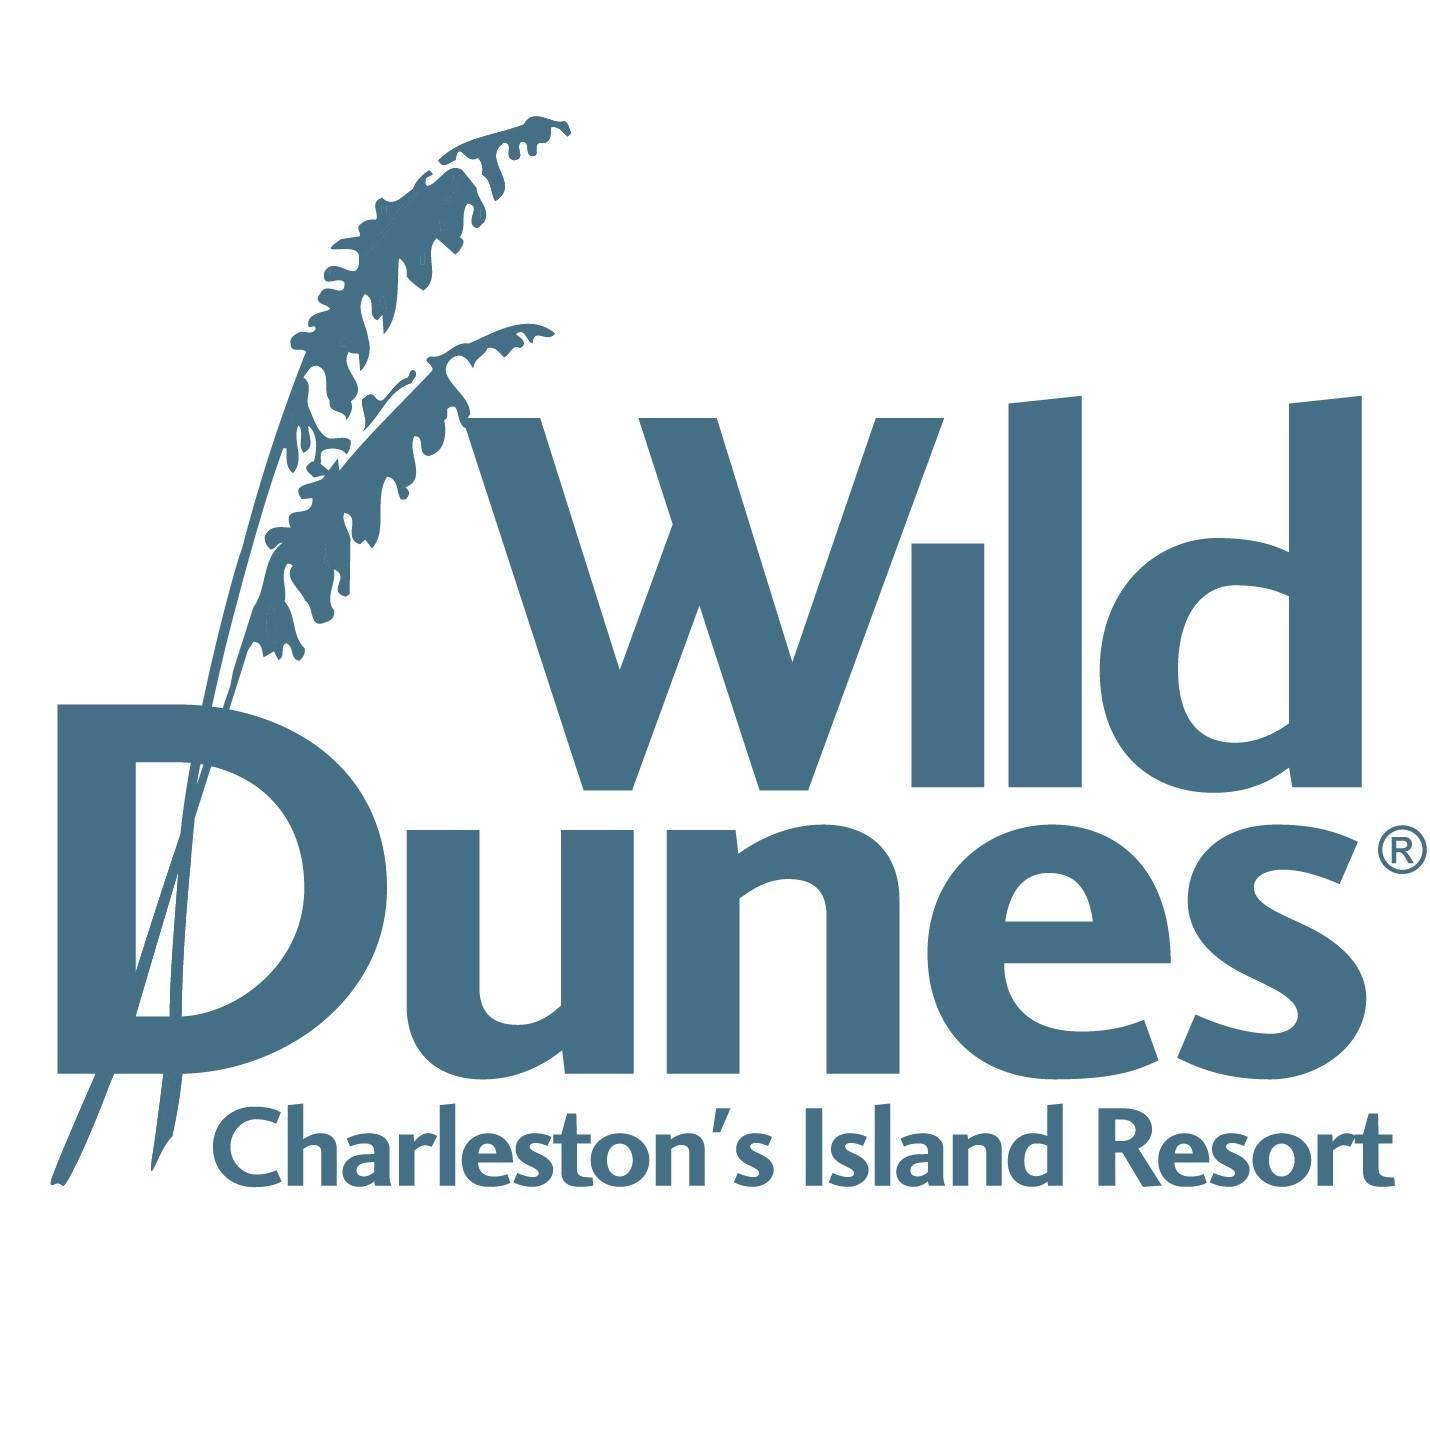 wild dunes resort logo.jpg